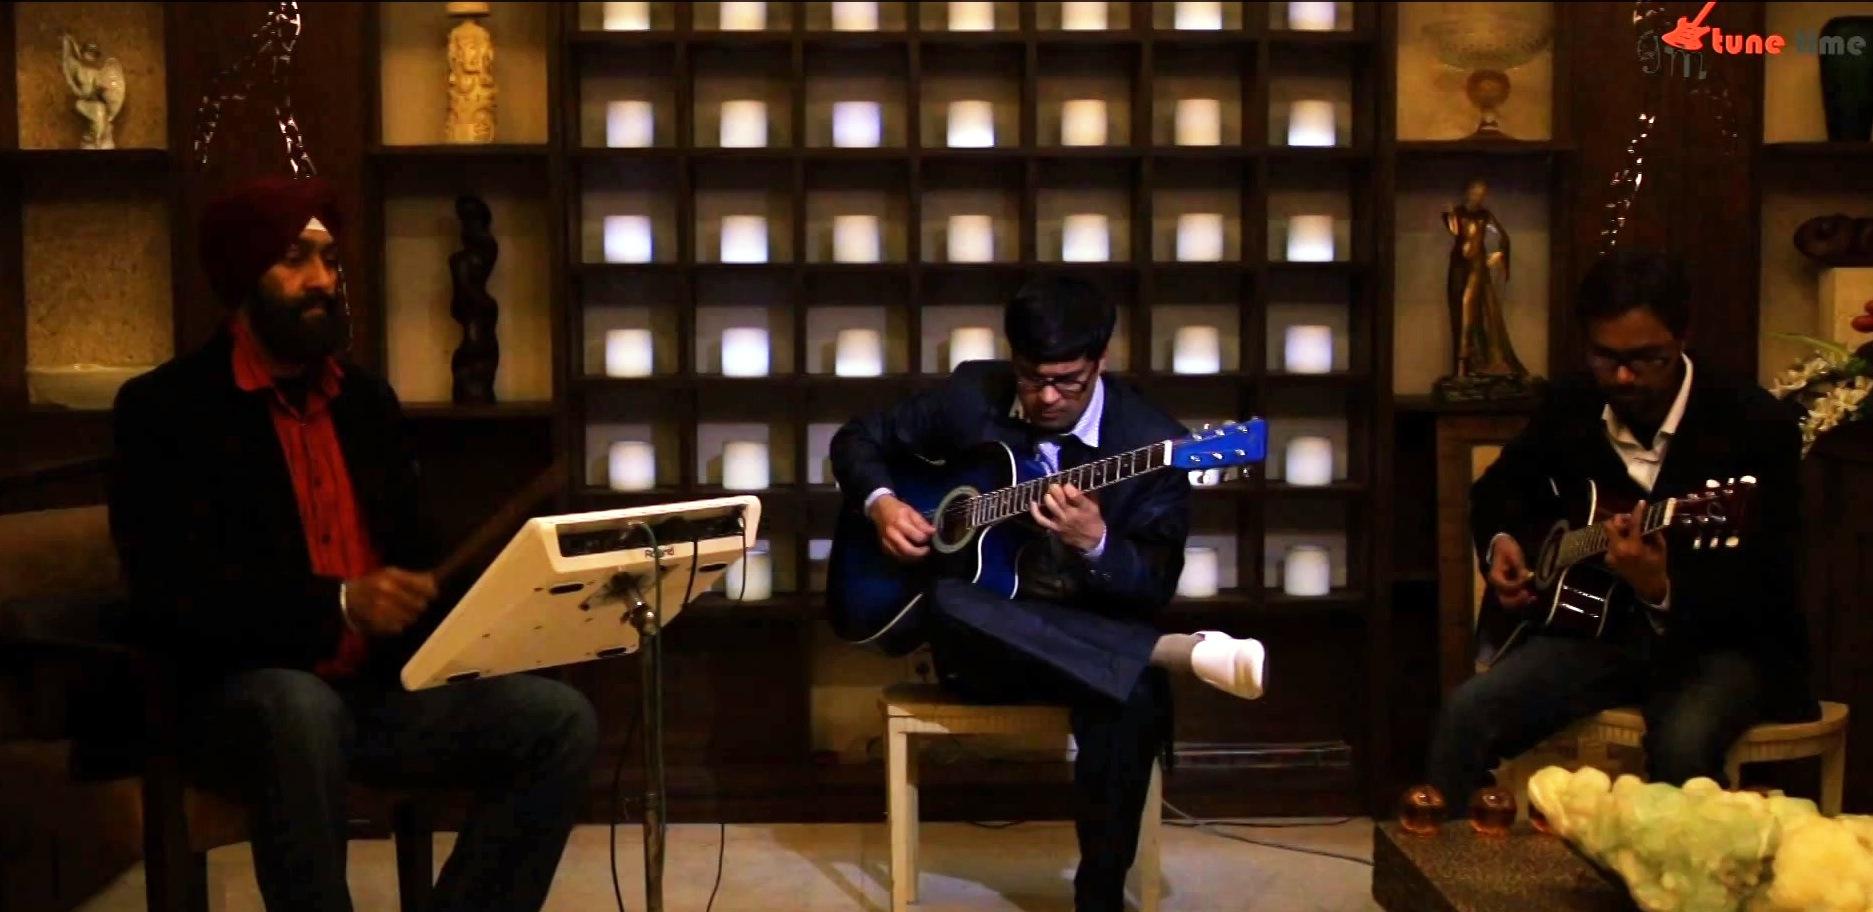 chaudhvin ka chand on guitar